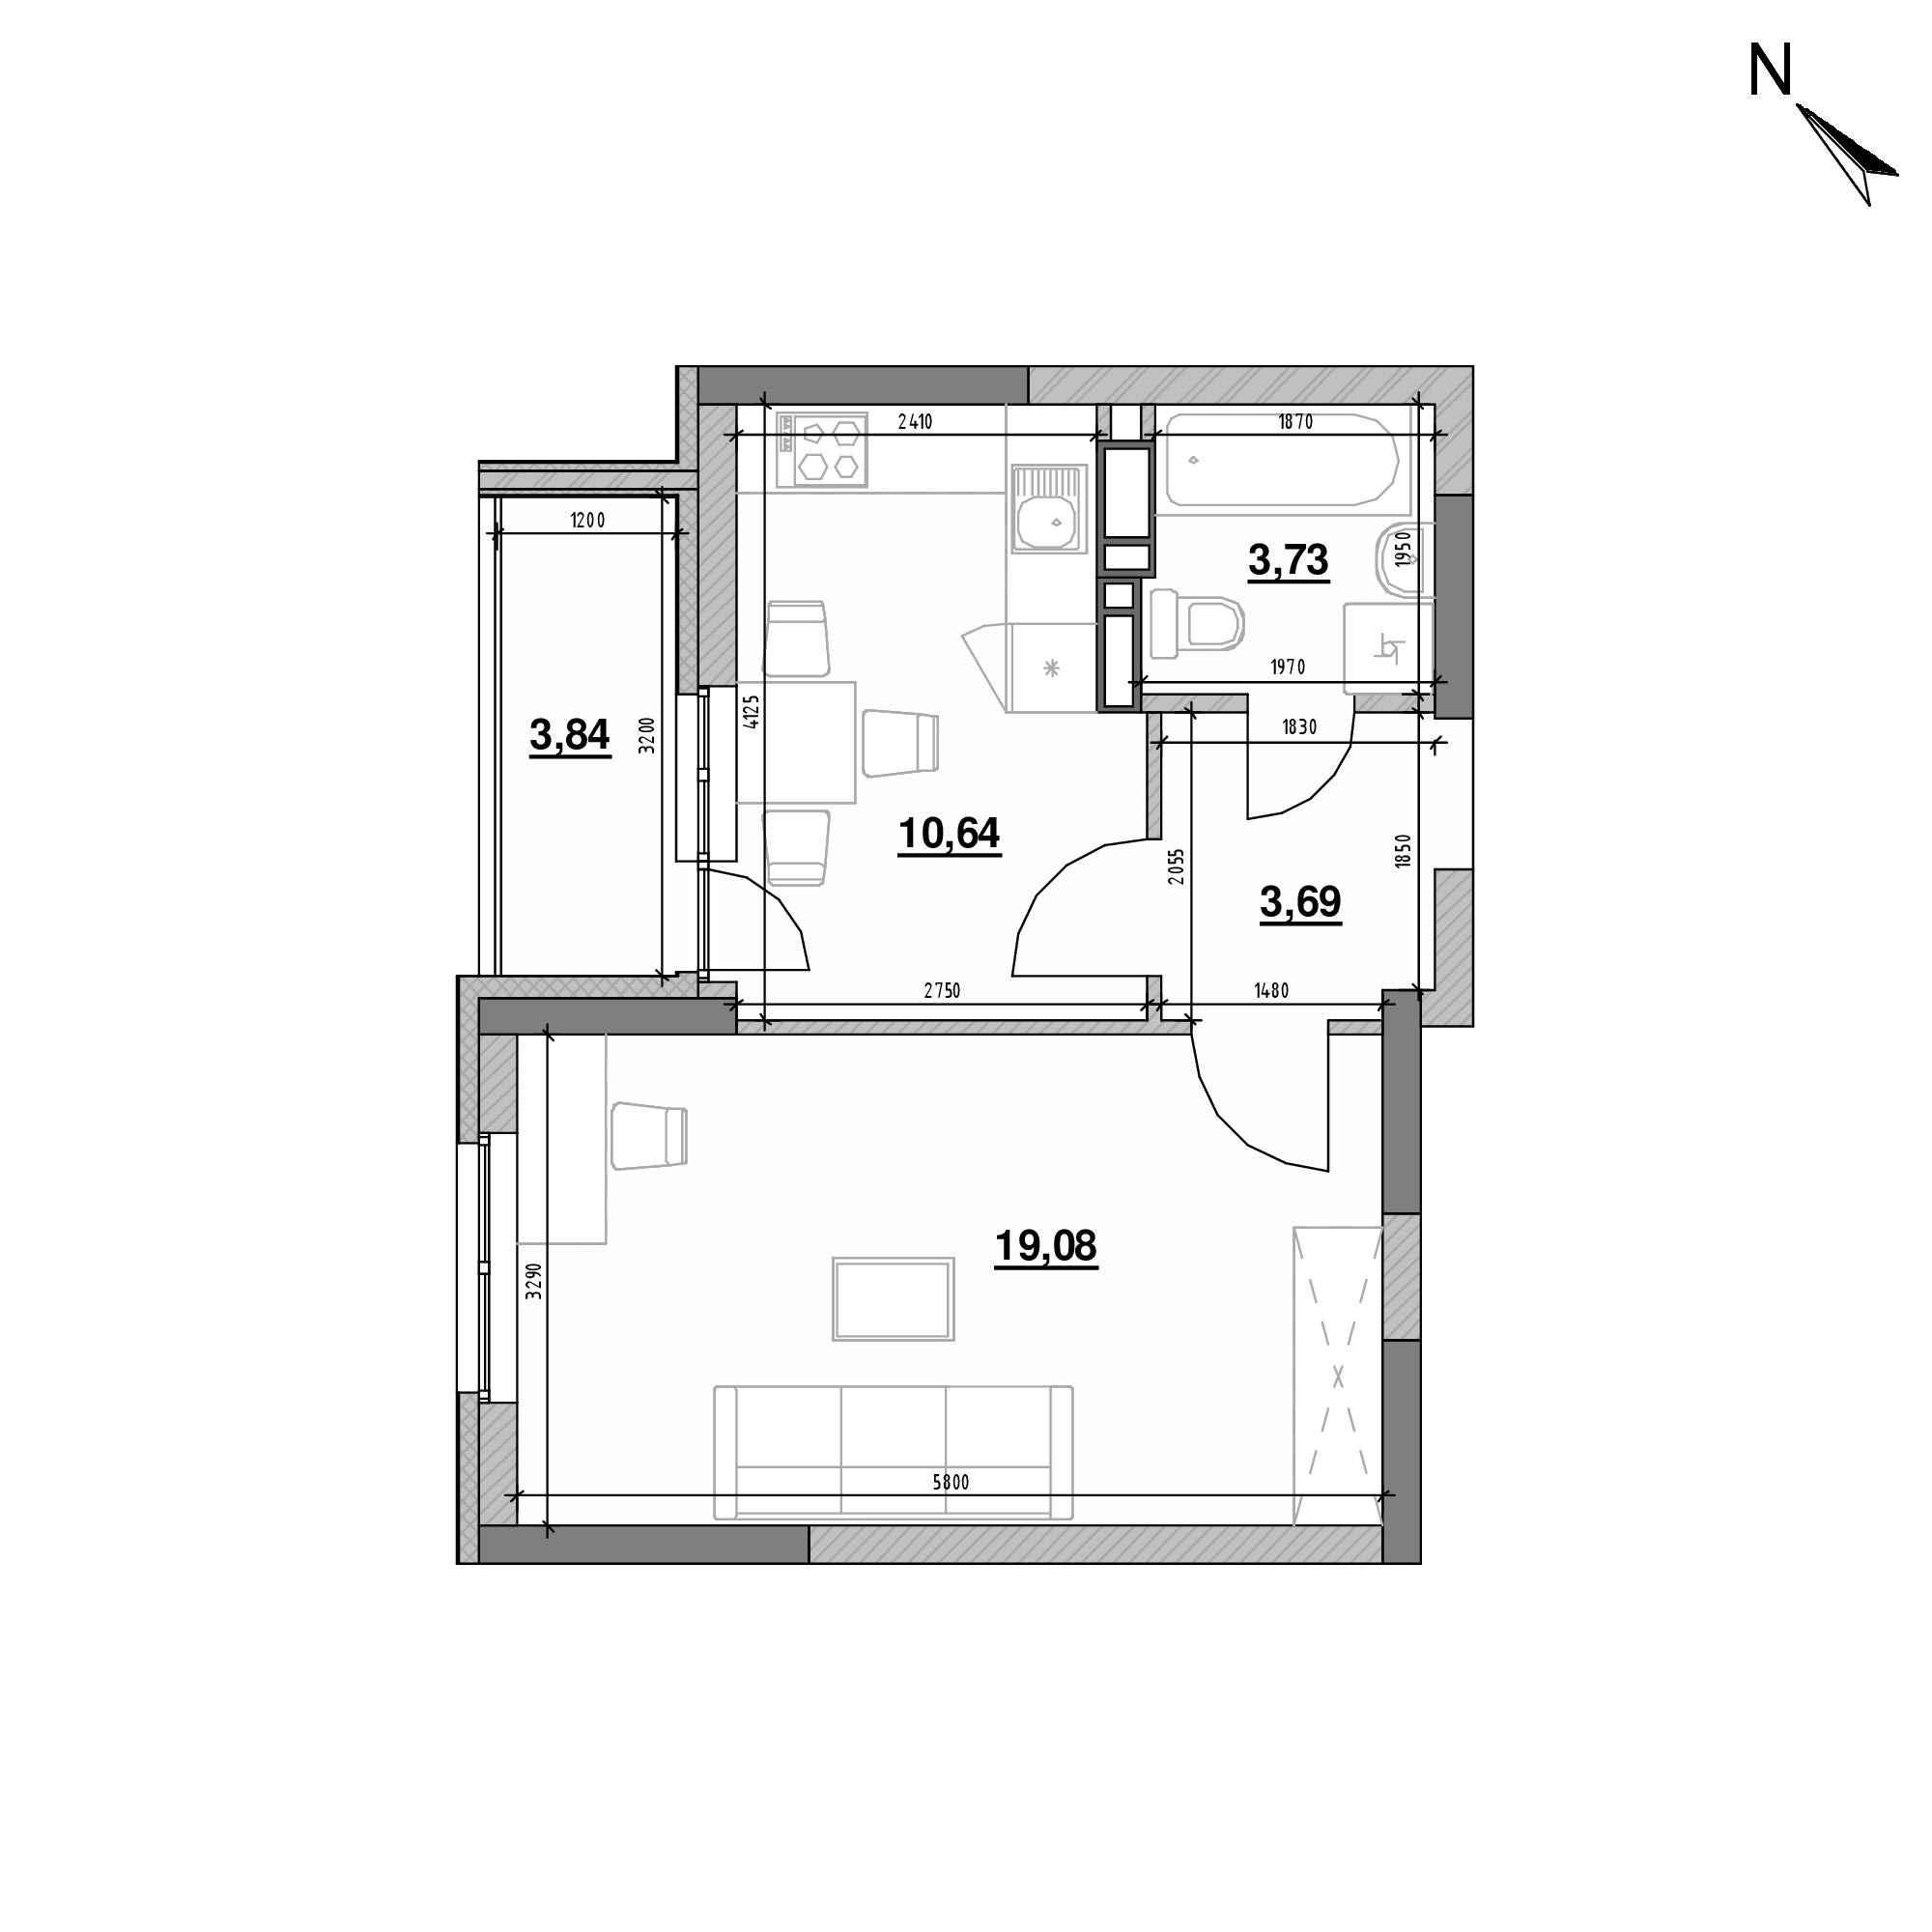 ЖК Оk'Land: планування 1-кімнатної квартири, №136, 40.98 м<sup>2</sup>